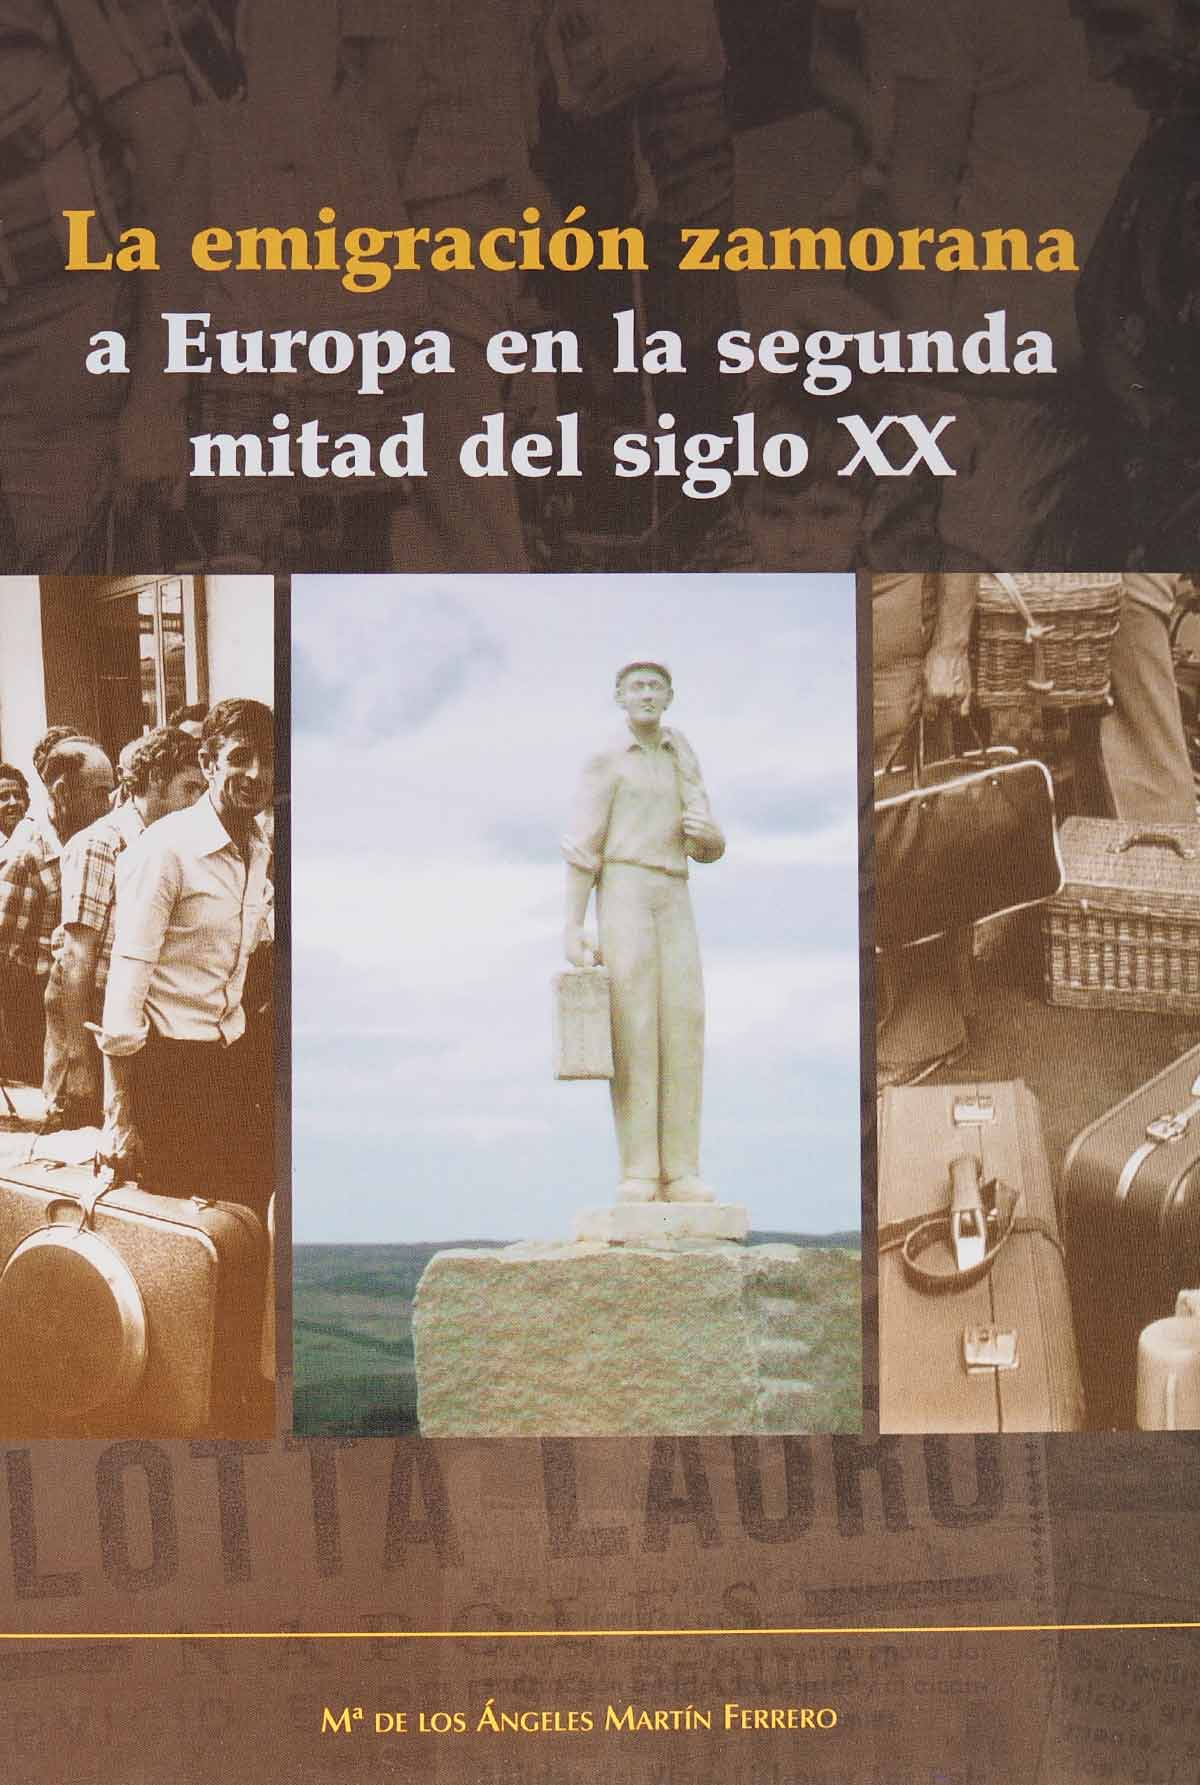 emigracion-zamorana-europa-seguna-mitad-siglo-xx-editorial-semuret